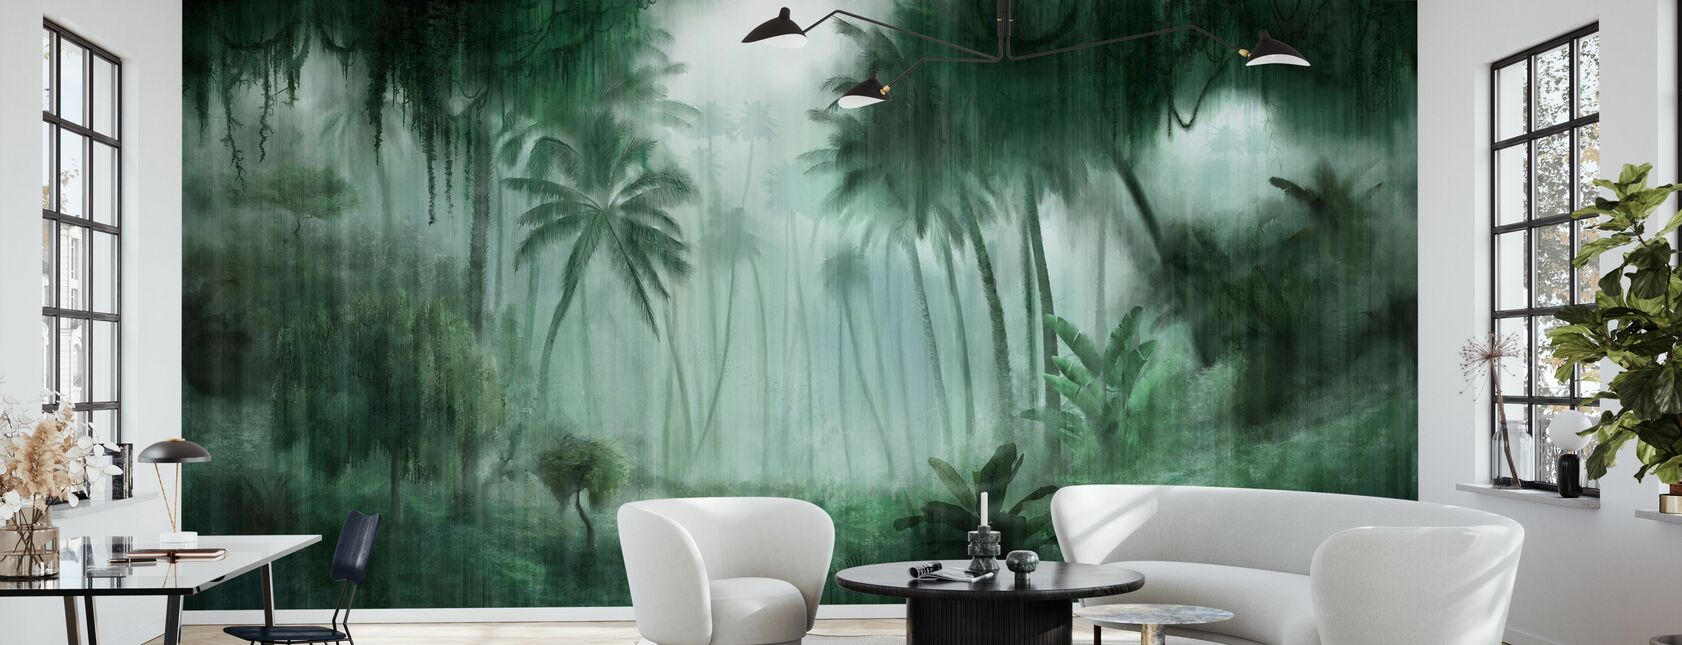 Definitive Tropical - Wallpaper - Living Room